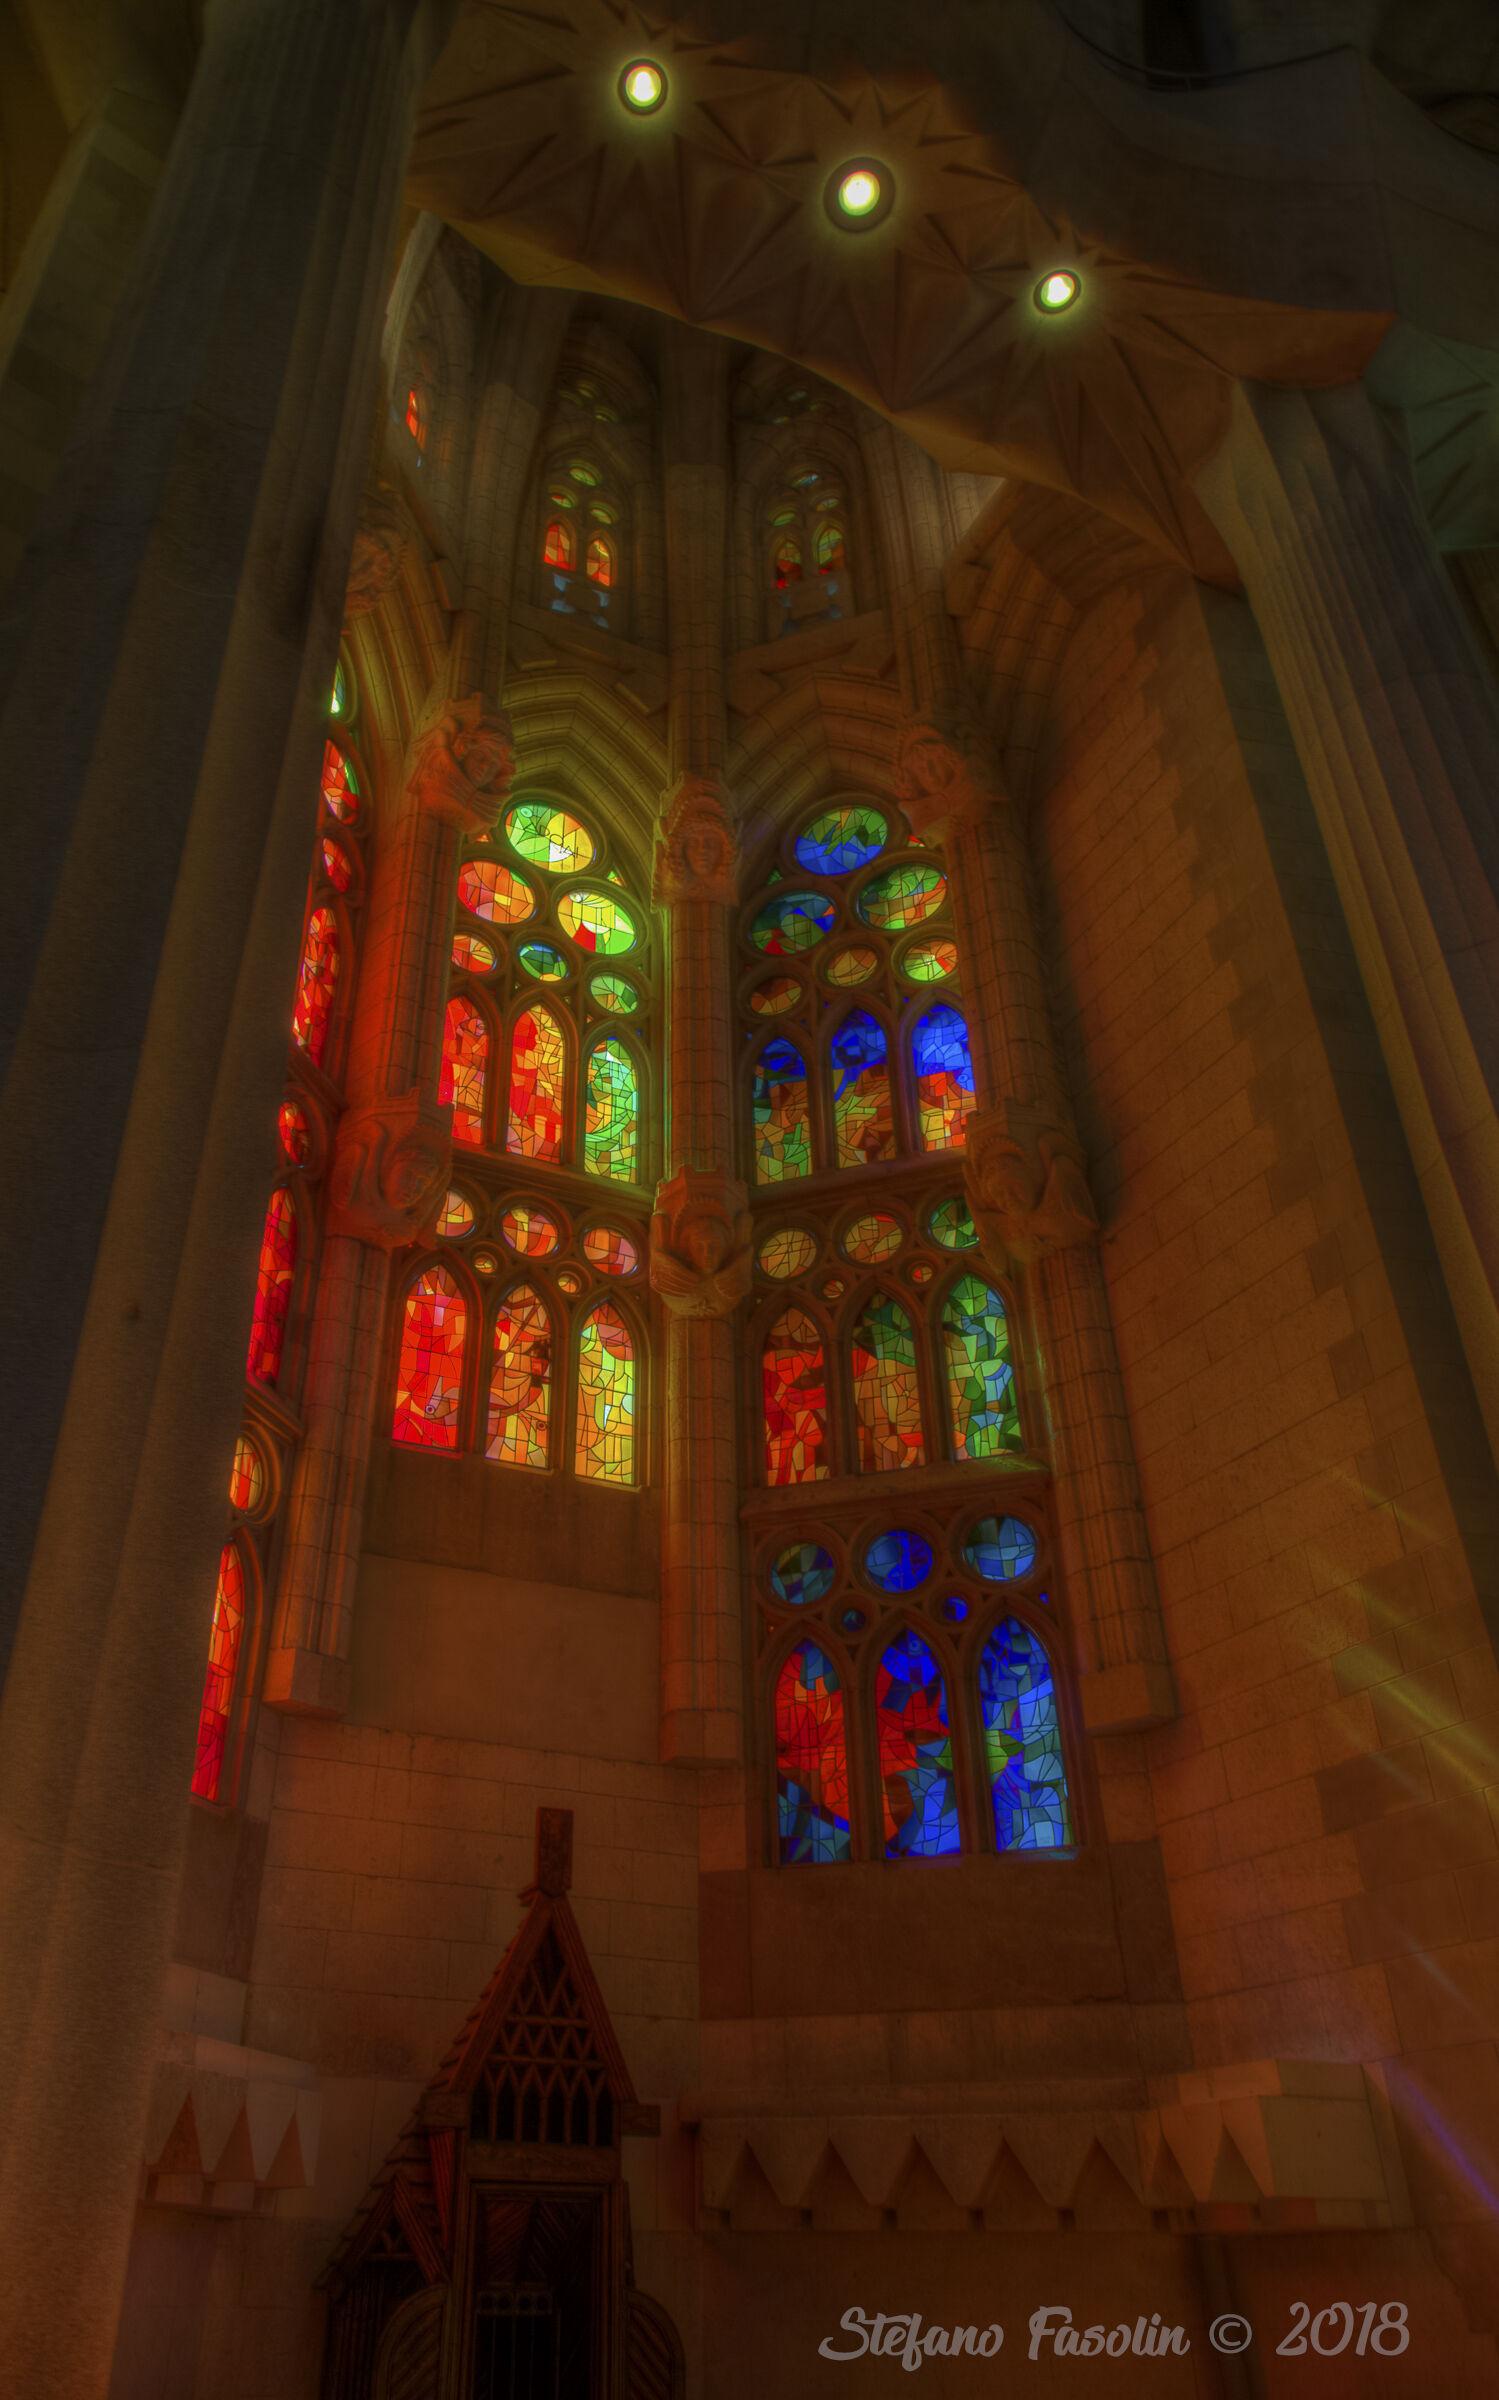 Lights of the Sagrada Familia...